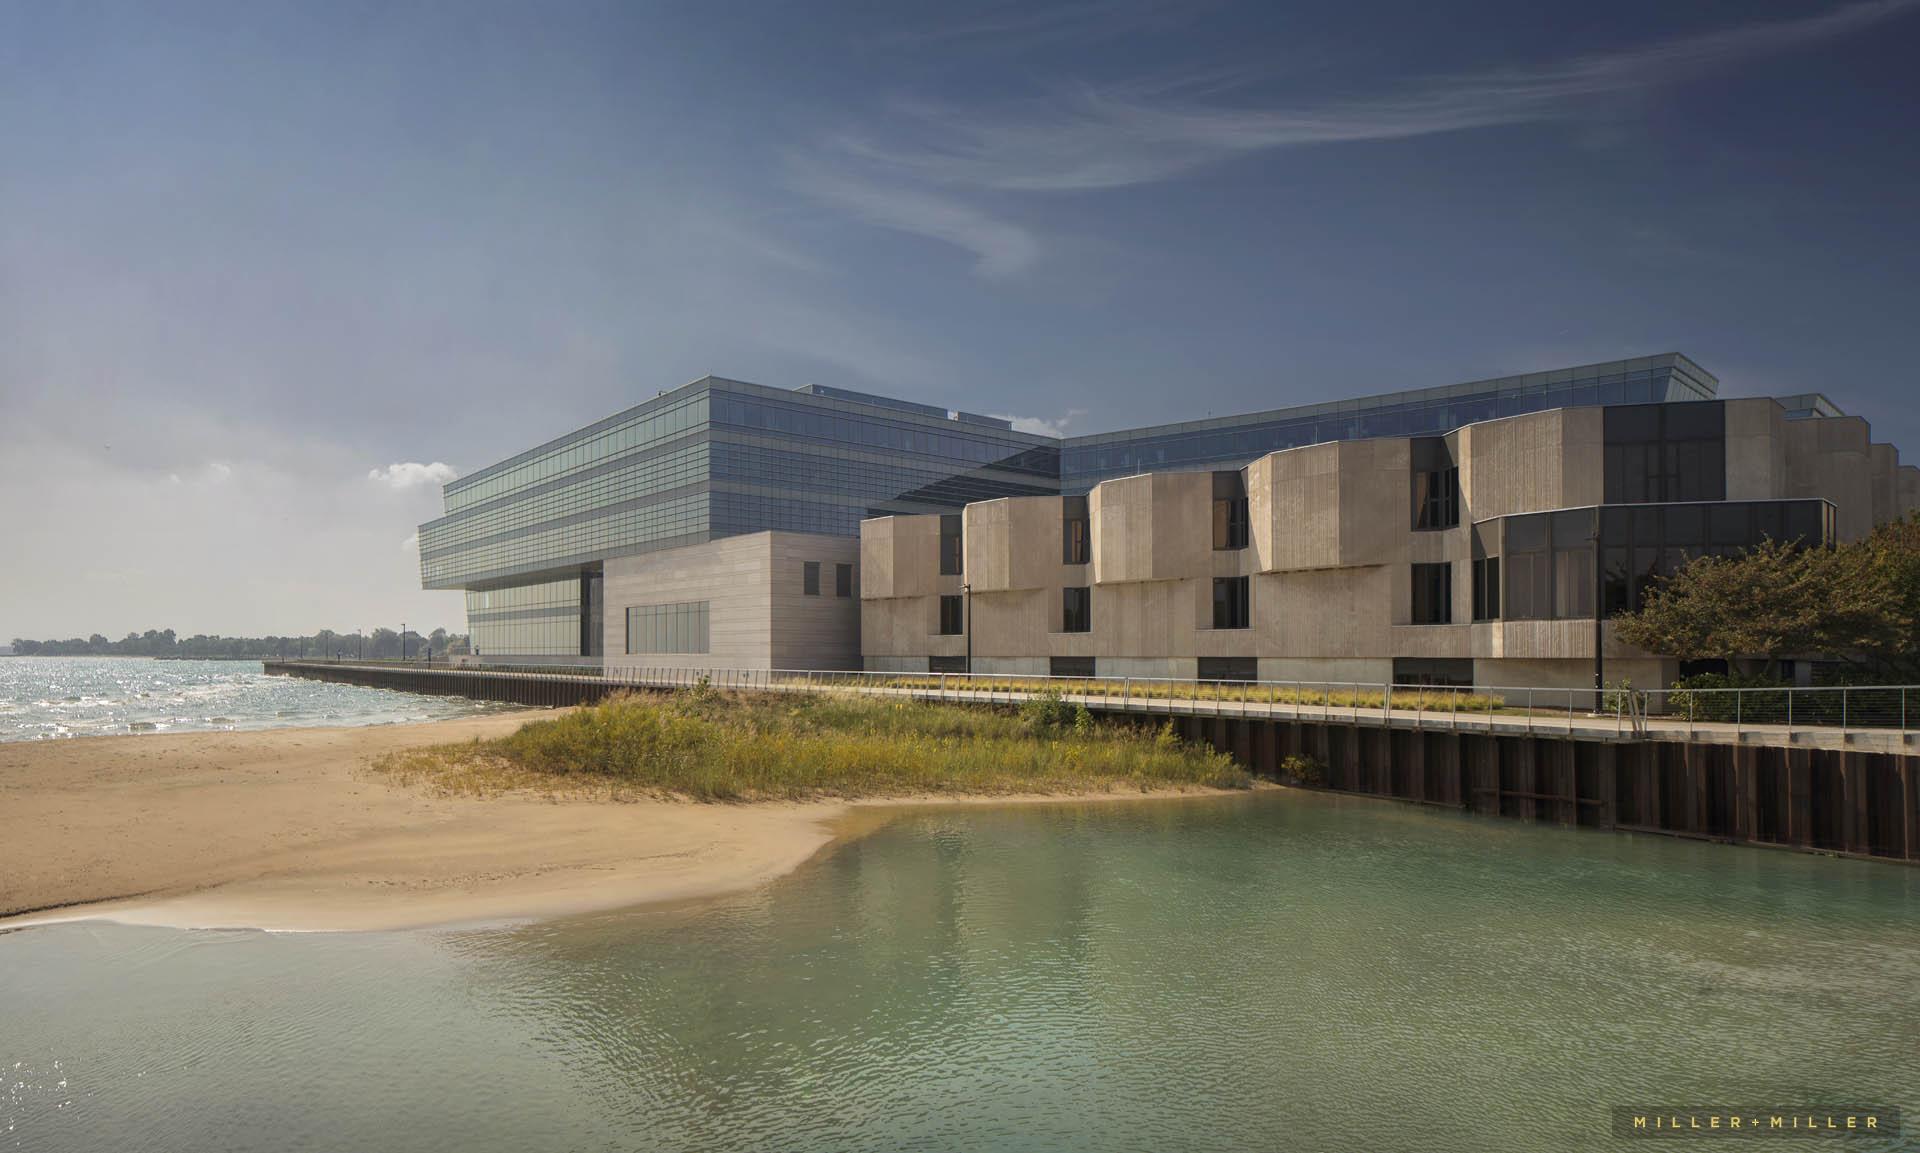 university-renovation-building-architectural-photos